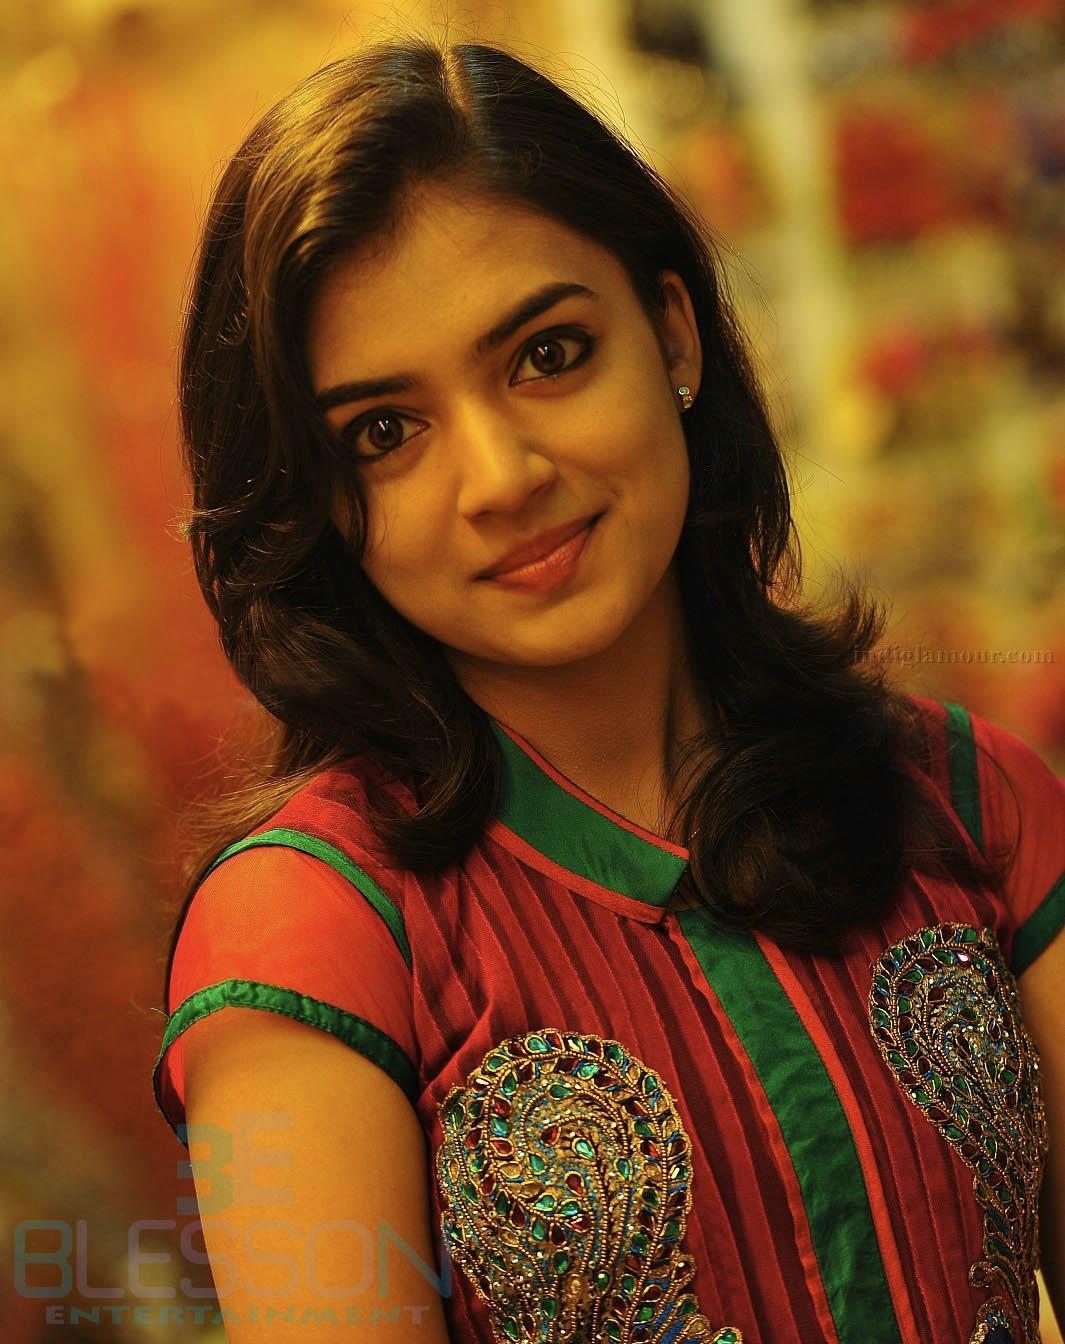 Nazriya Nazim Cute Photos: Free Actor & Actress Photo Galleries,wallpapers & Imgs